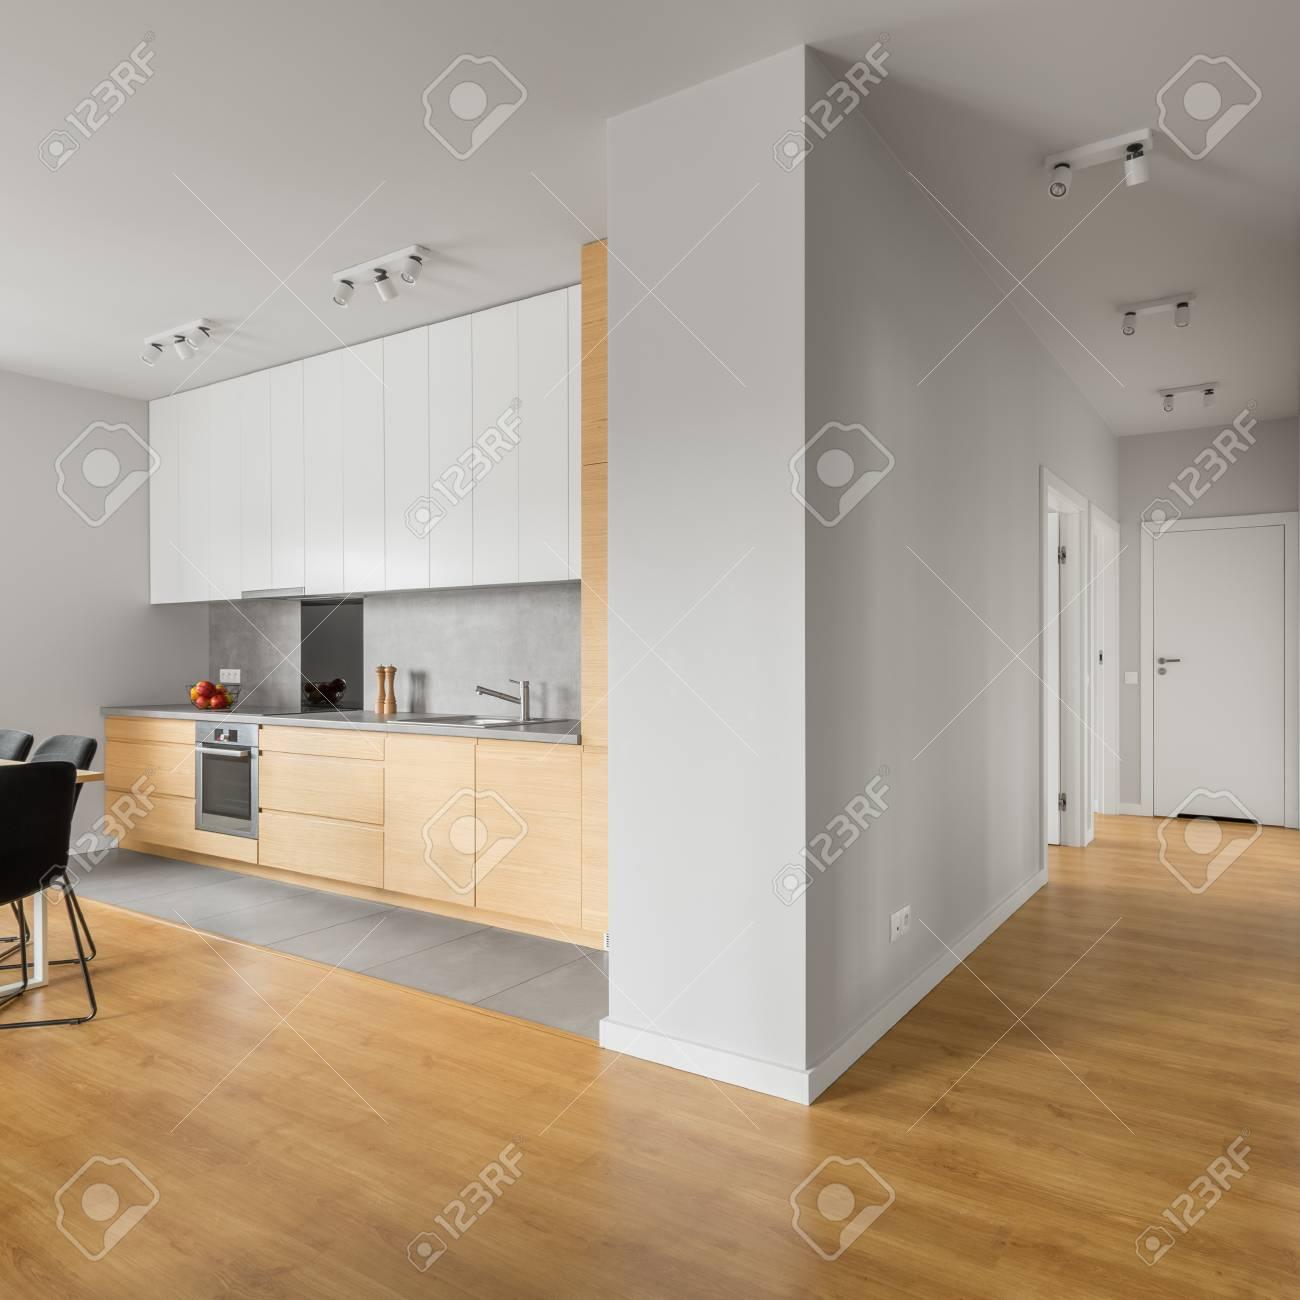 Berühmt Küche Deckenleuchte Fotos - Küchen Ideen Modern ...